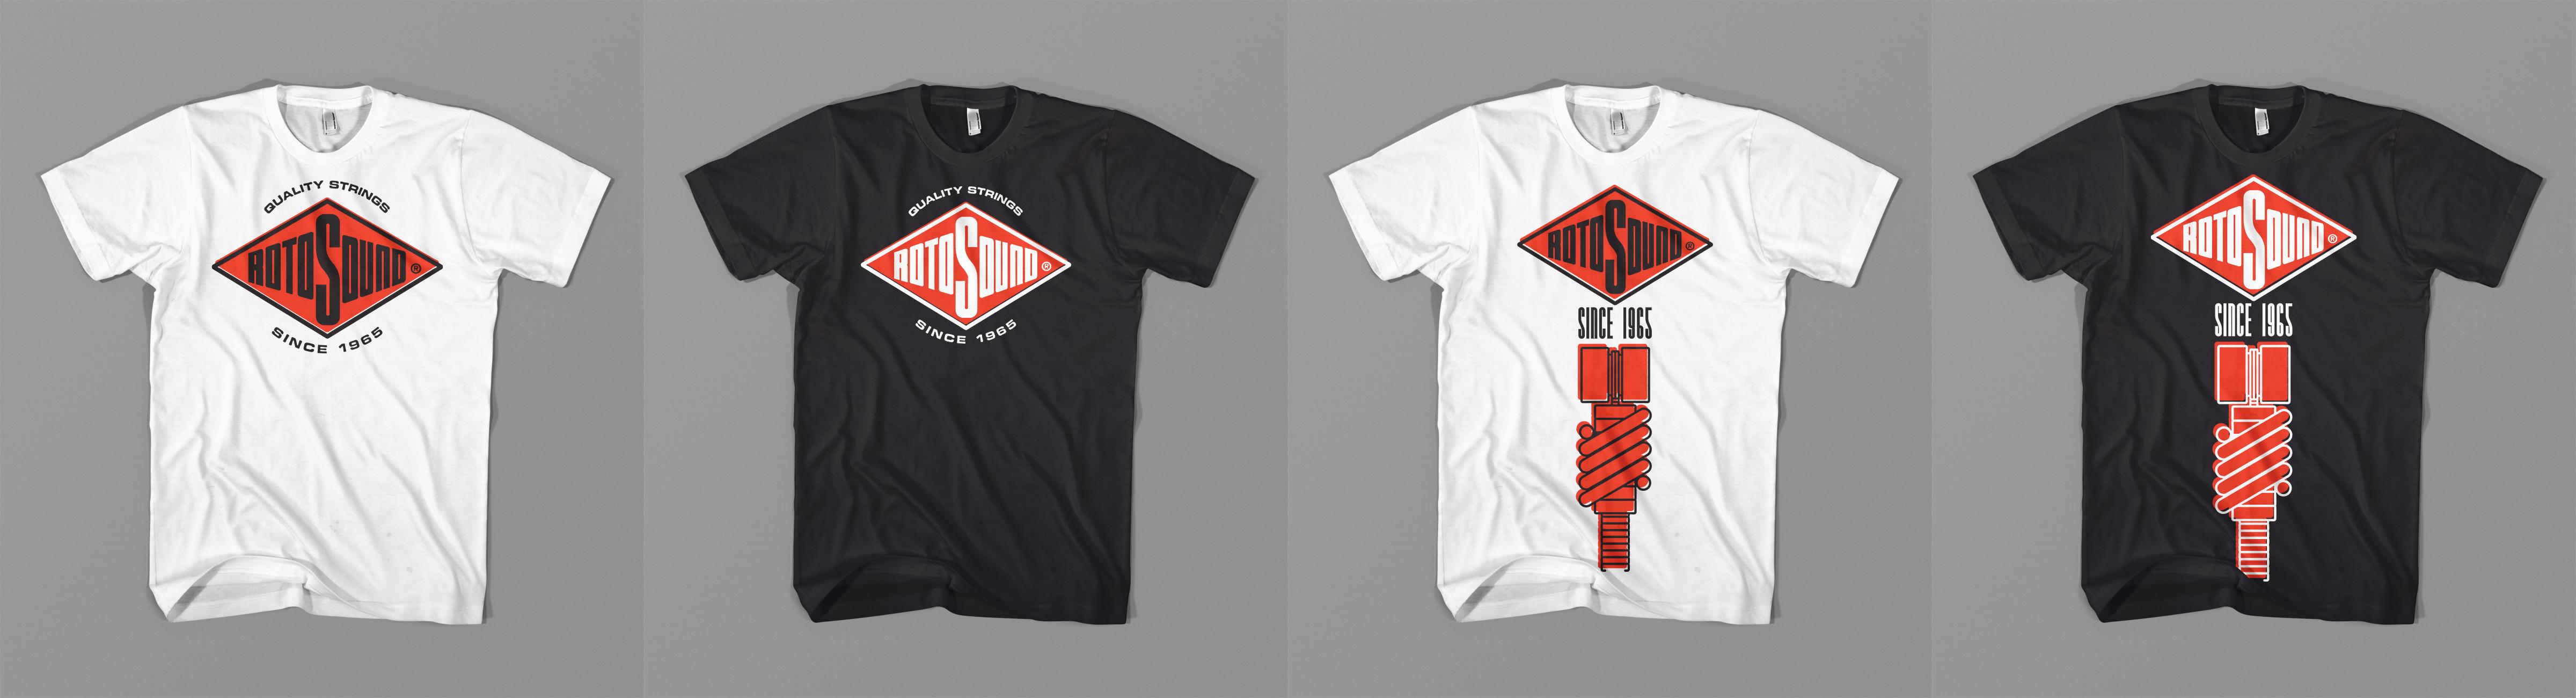 Saos rotosound swing bass 50th apparel design contest rev 01 mockups